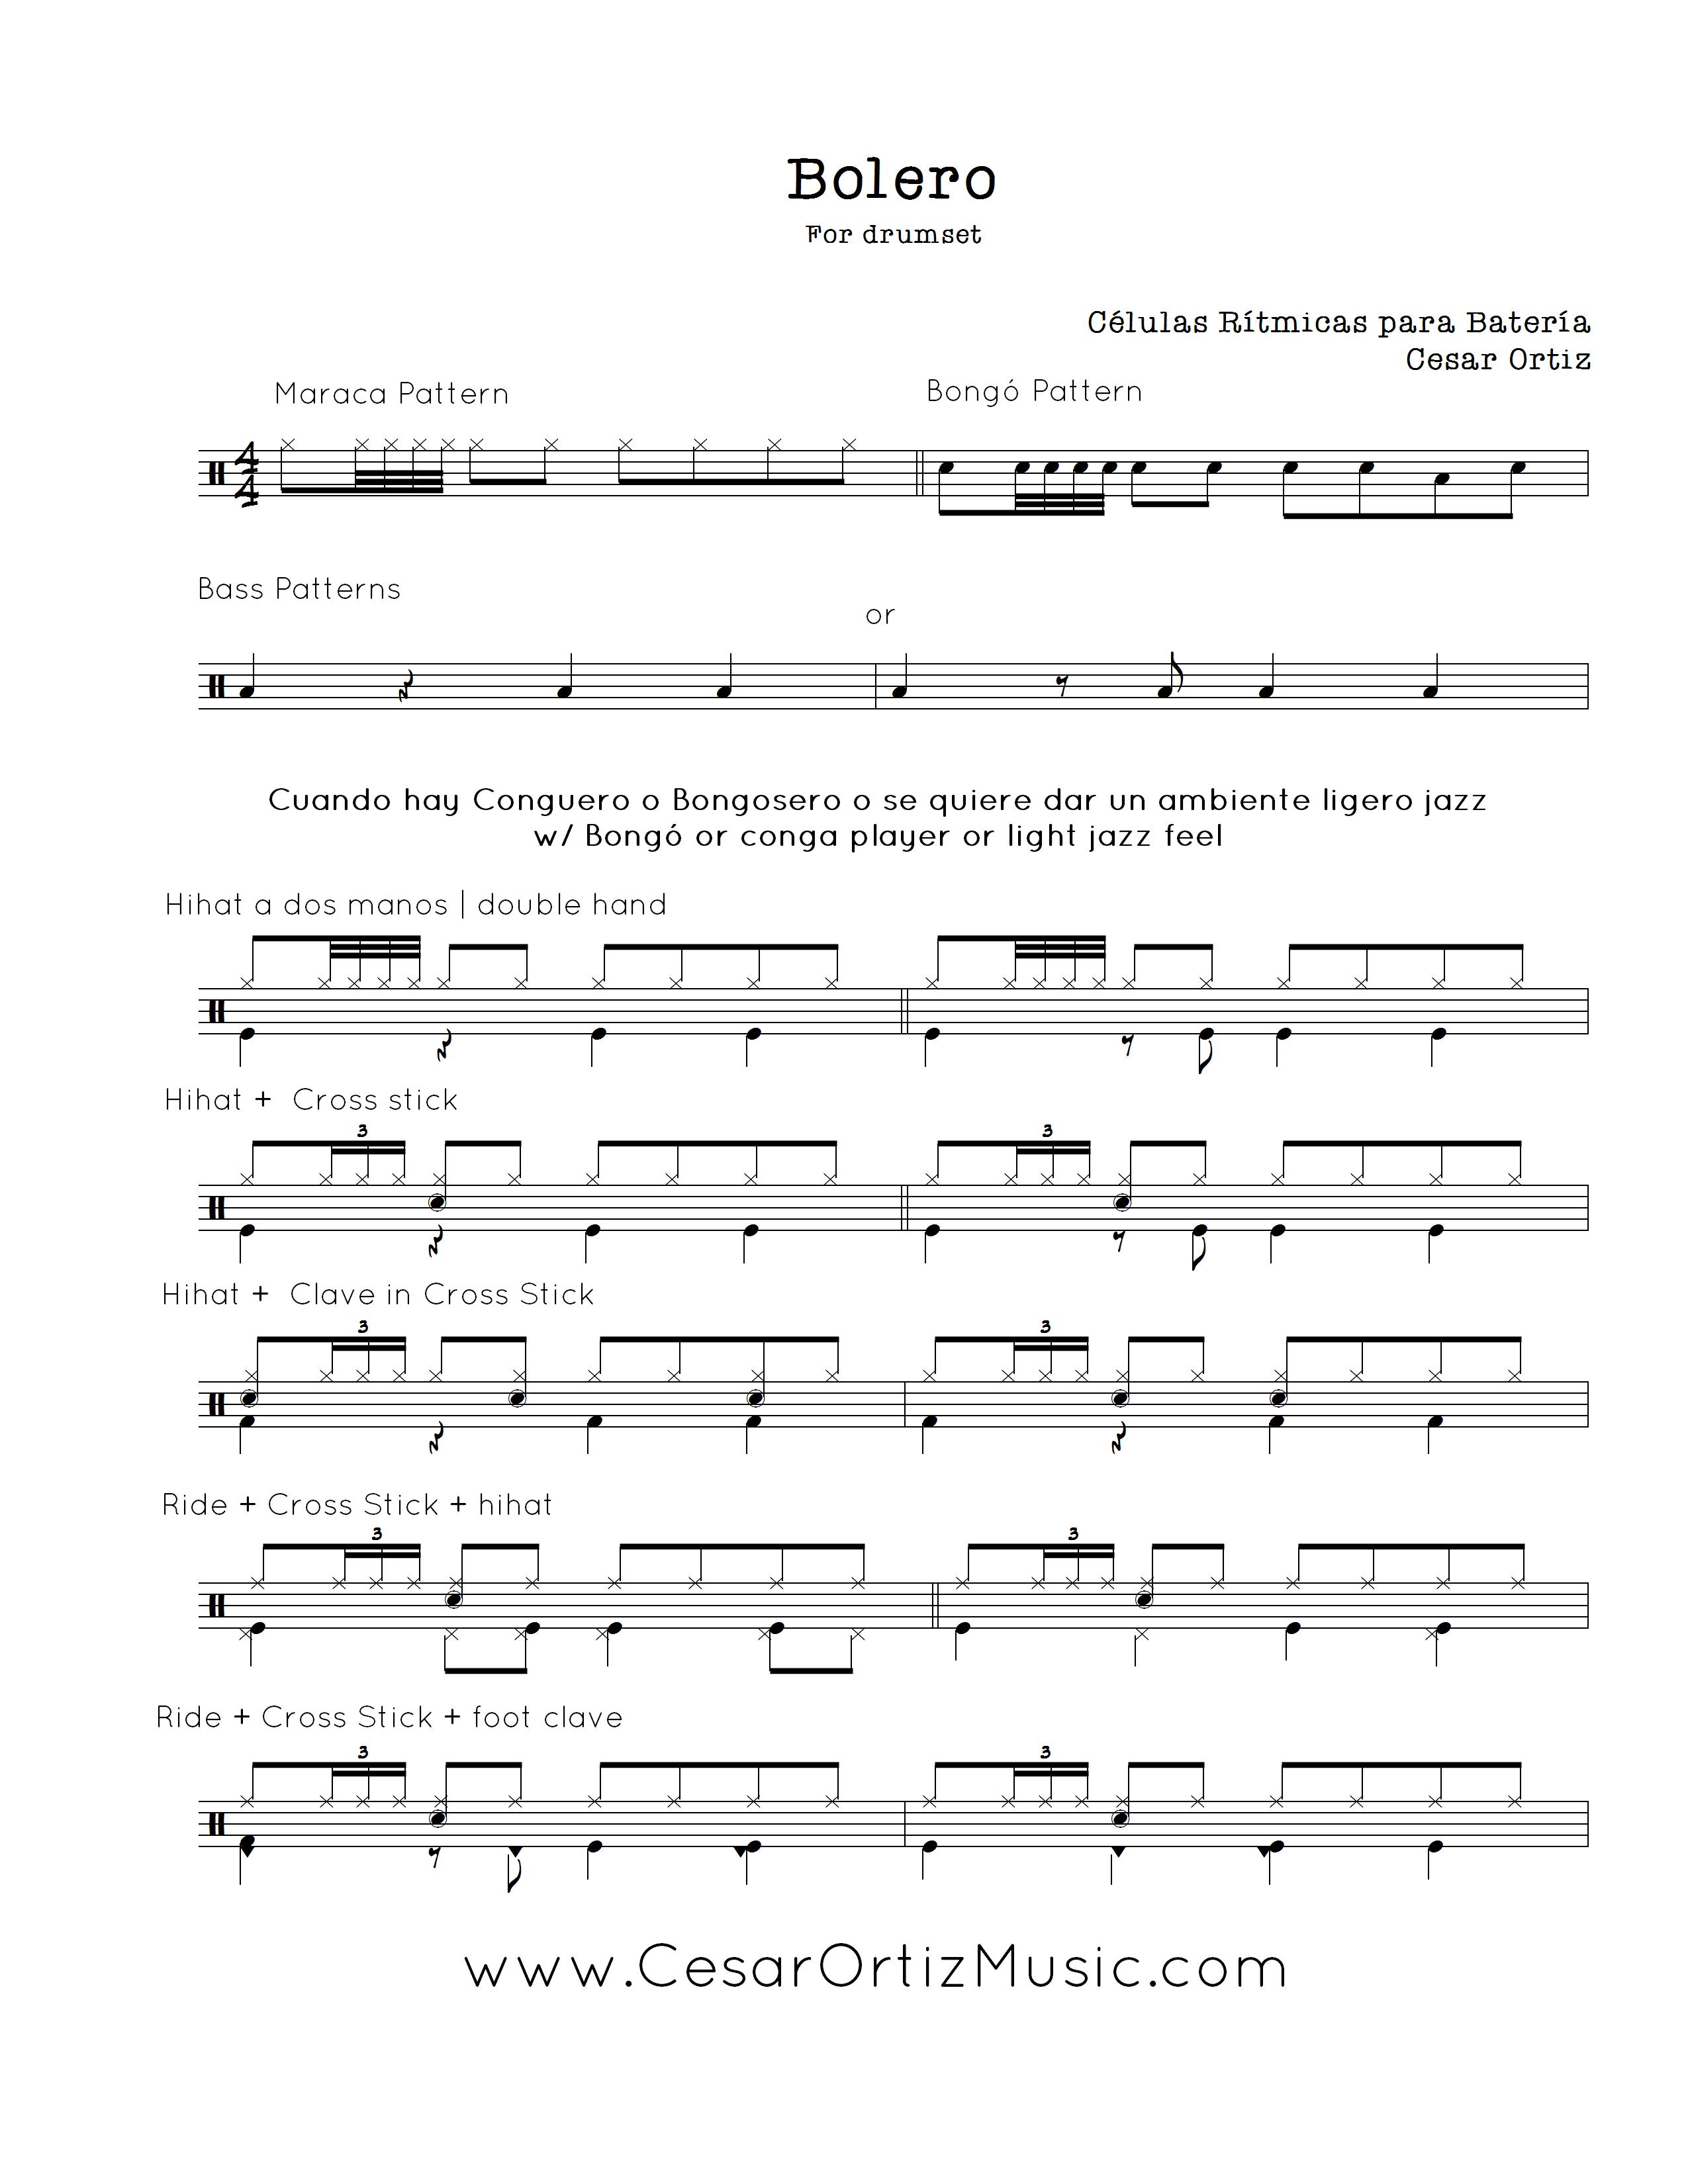 Bolero jazz para Batería | Cuban Grooves for drumset (page 1